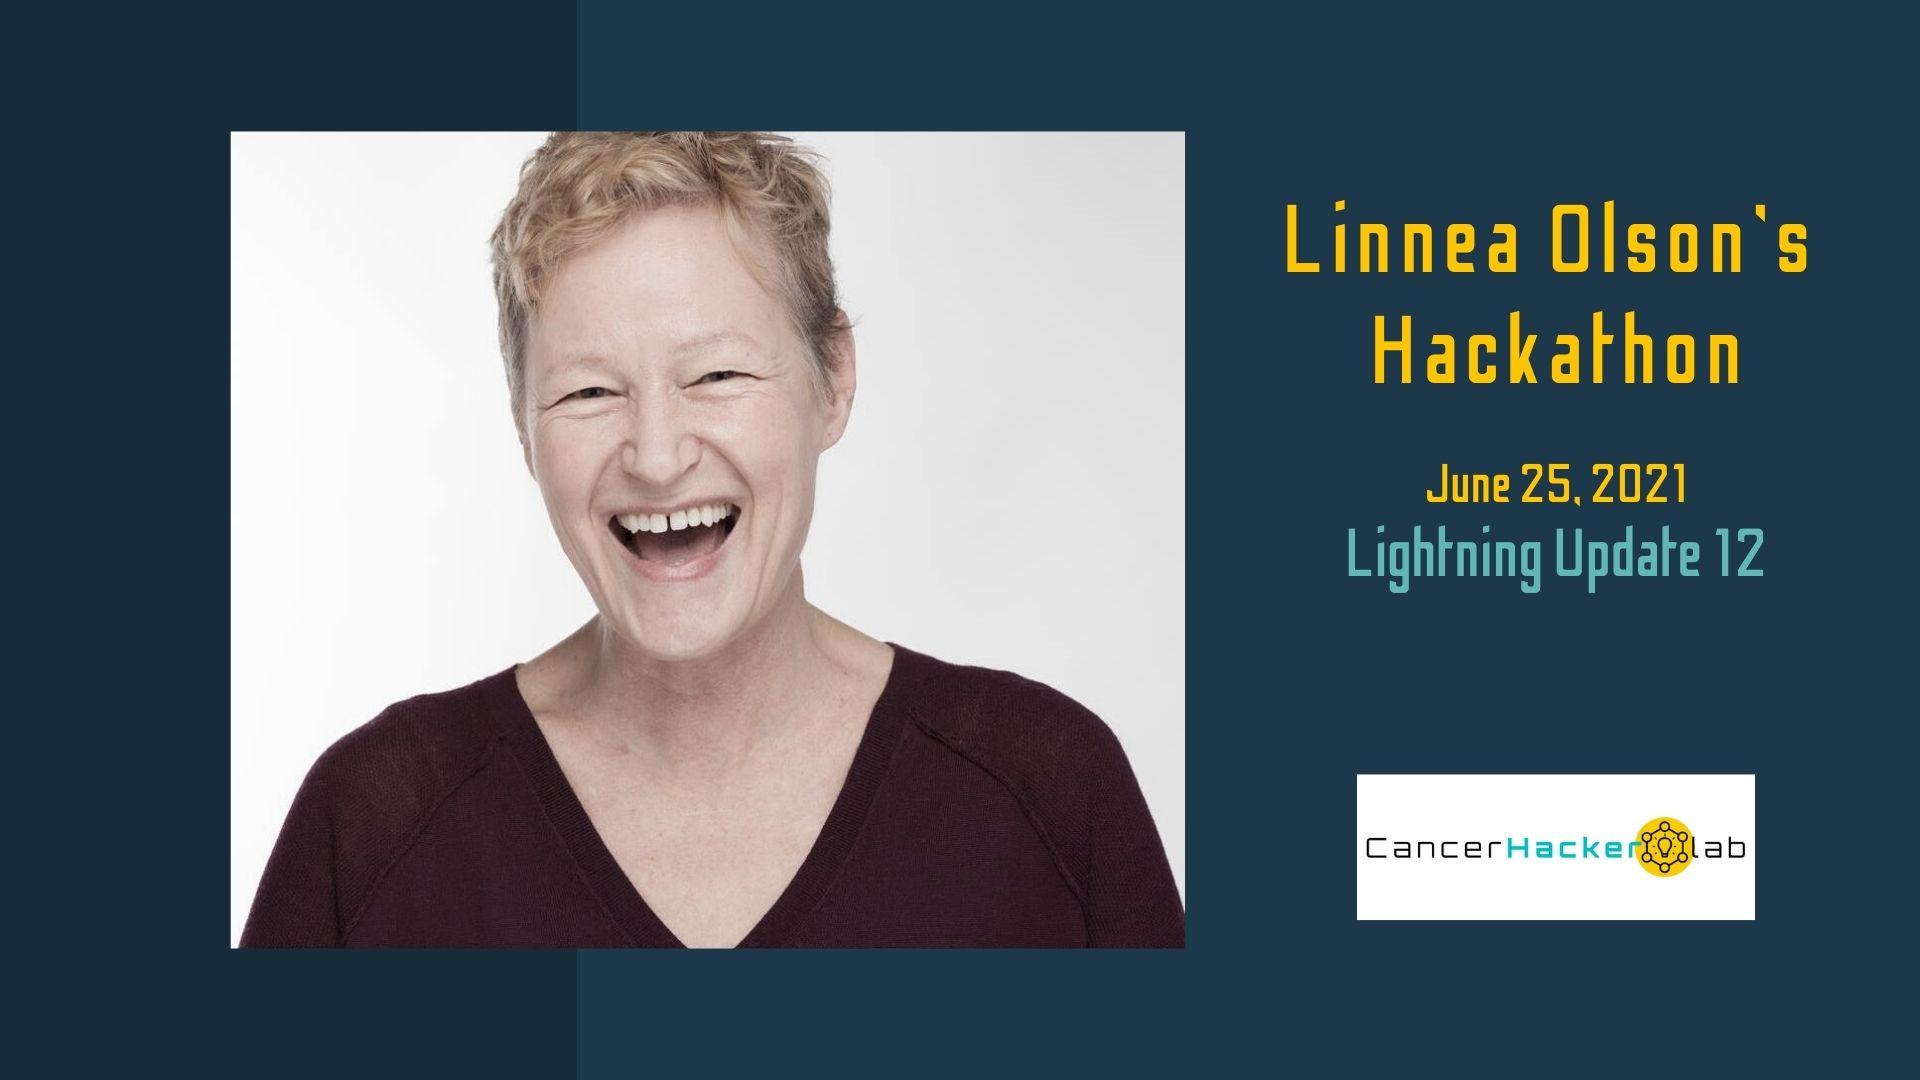 Linnea Olson Update #12